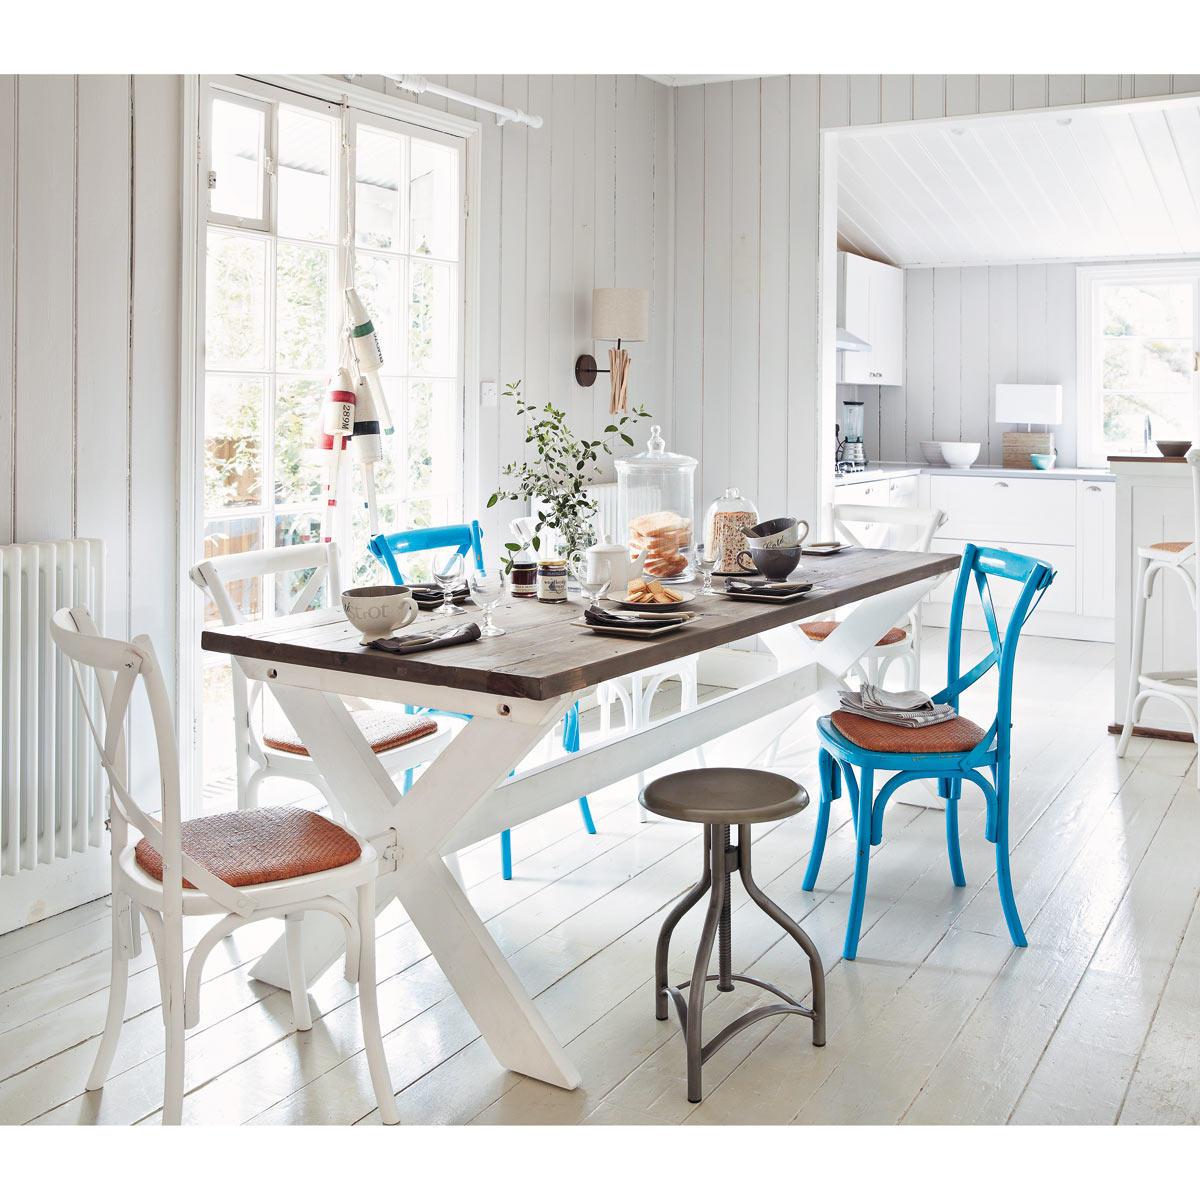 cucina maison du monde sedie shabbate in blu - Arredamento Shabby